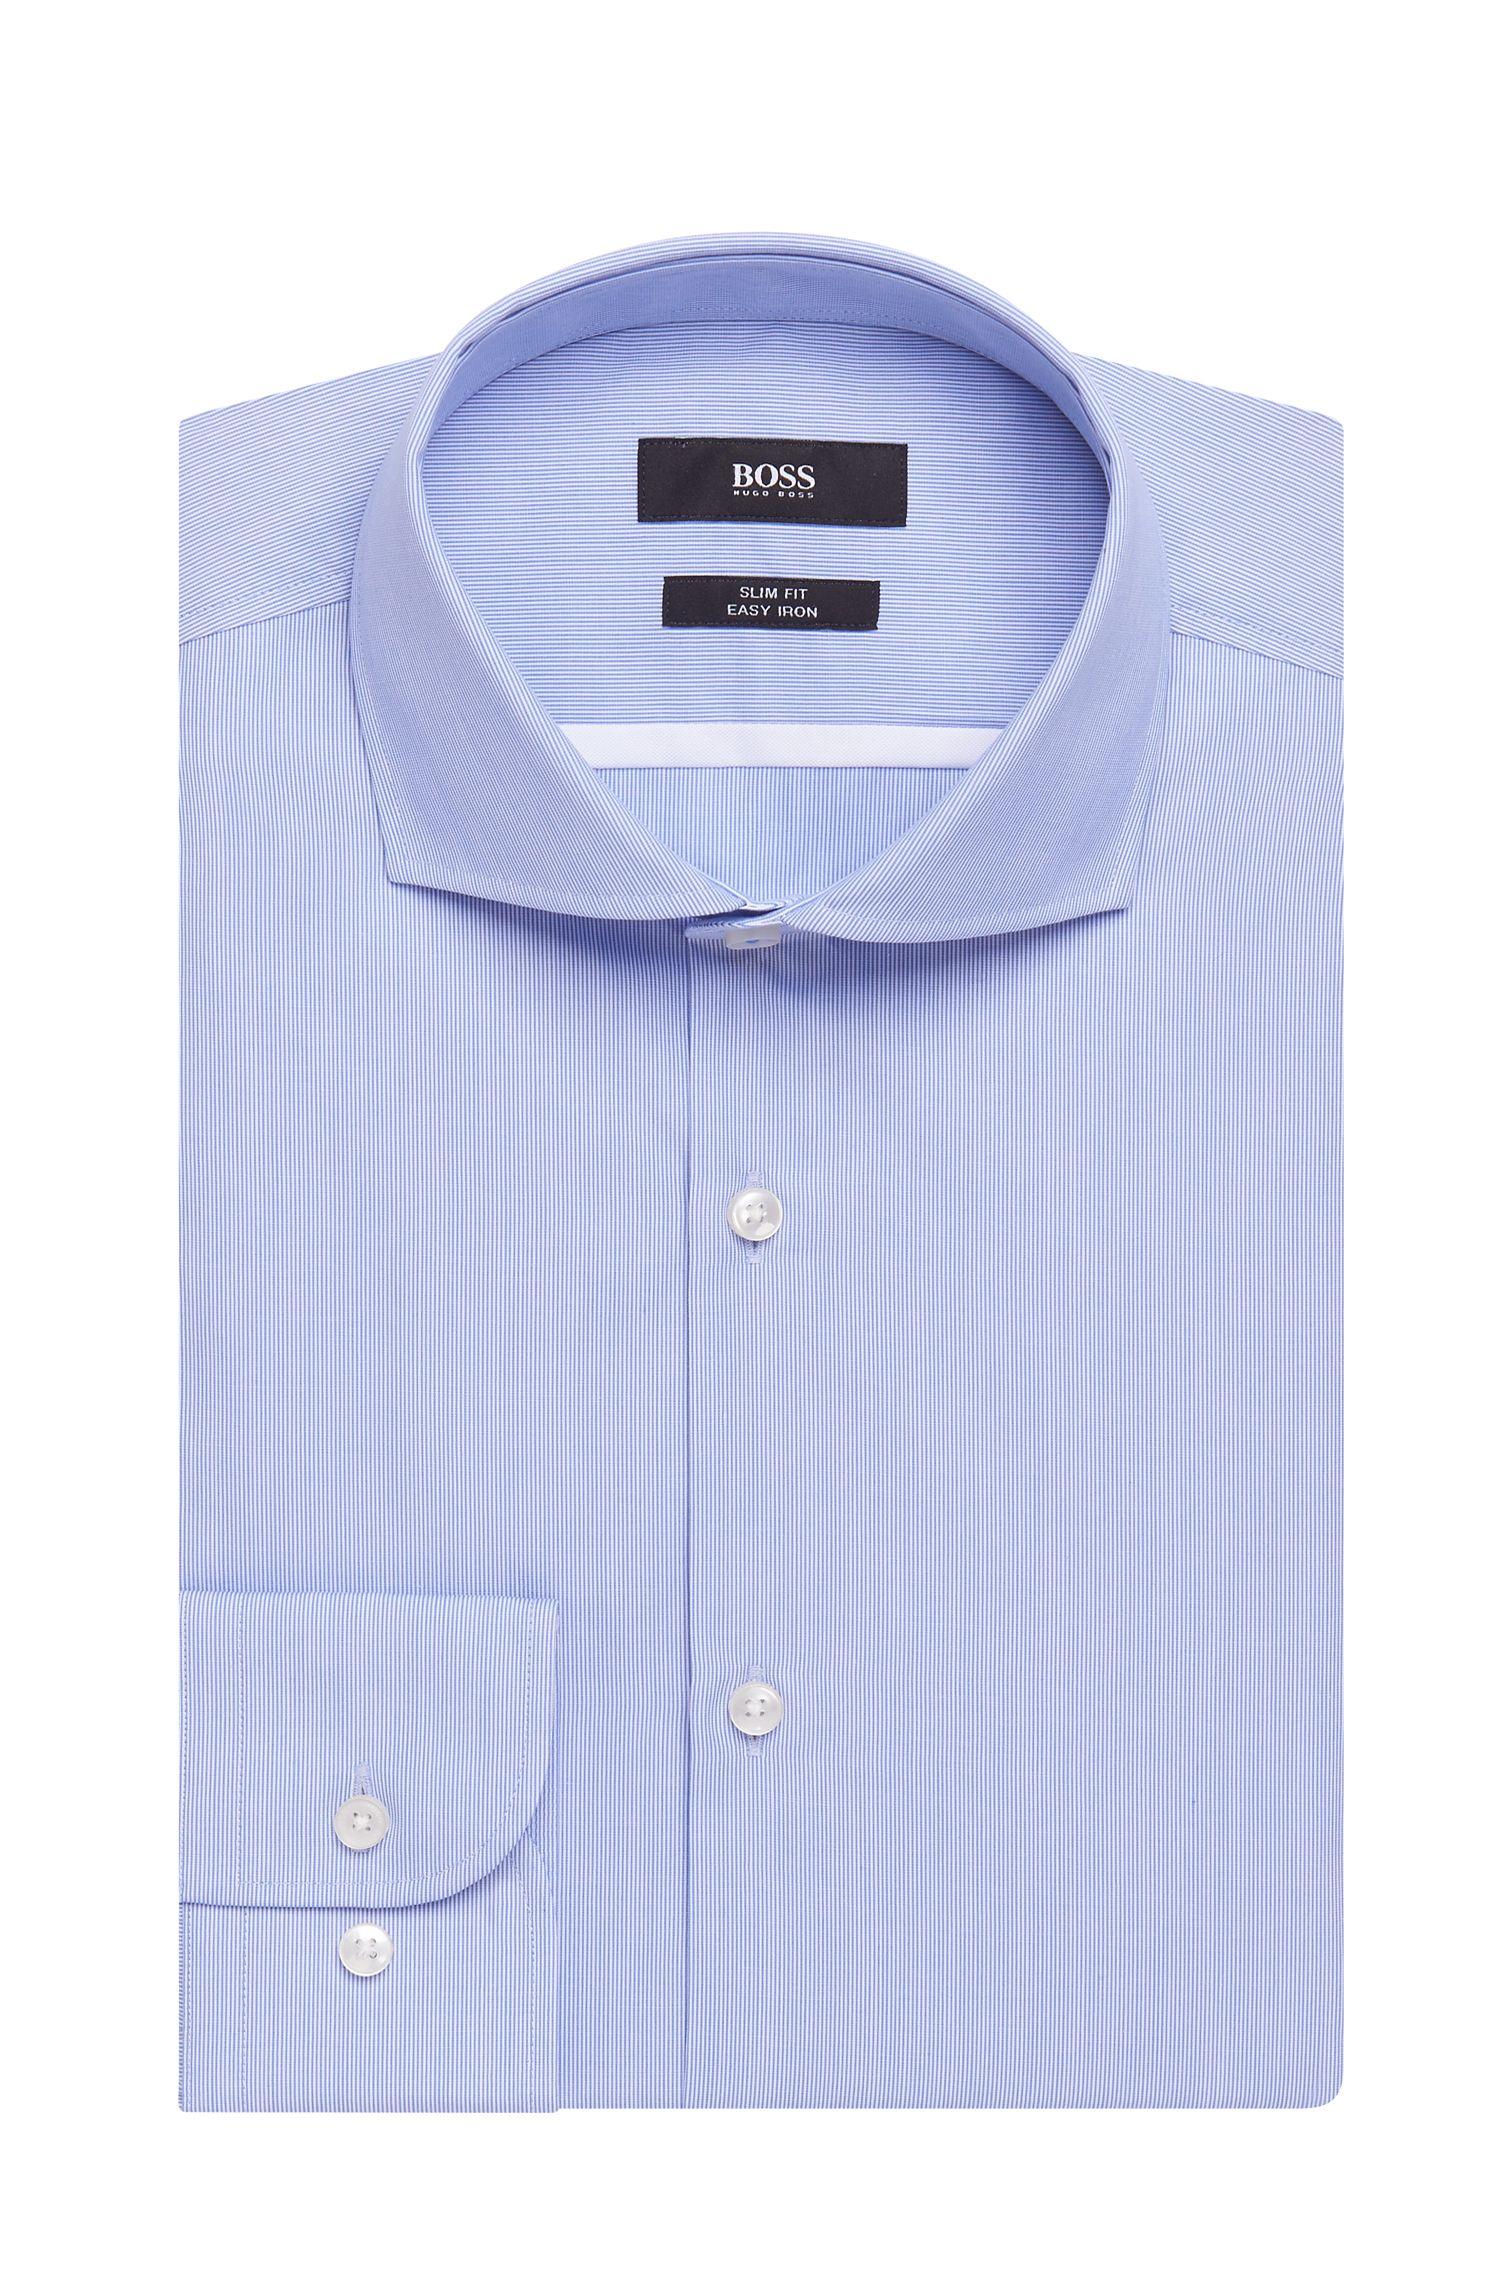 Striped Easy Iron Italian Cotton Poplin Dress Shirt, Slim Fit | Jerrin